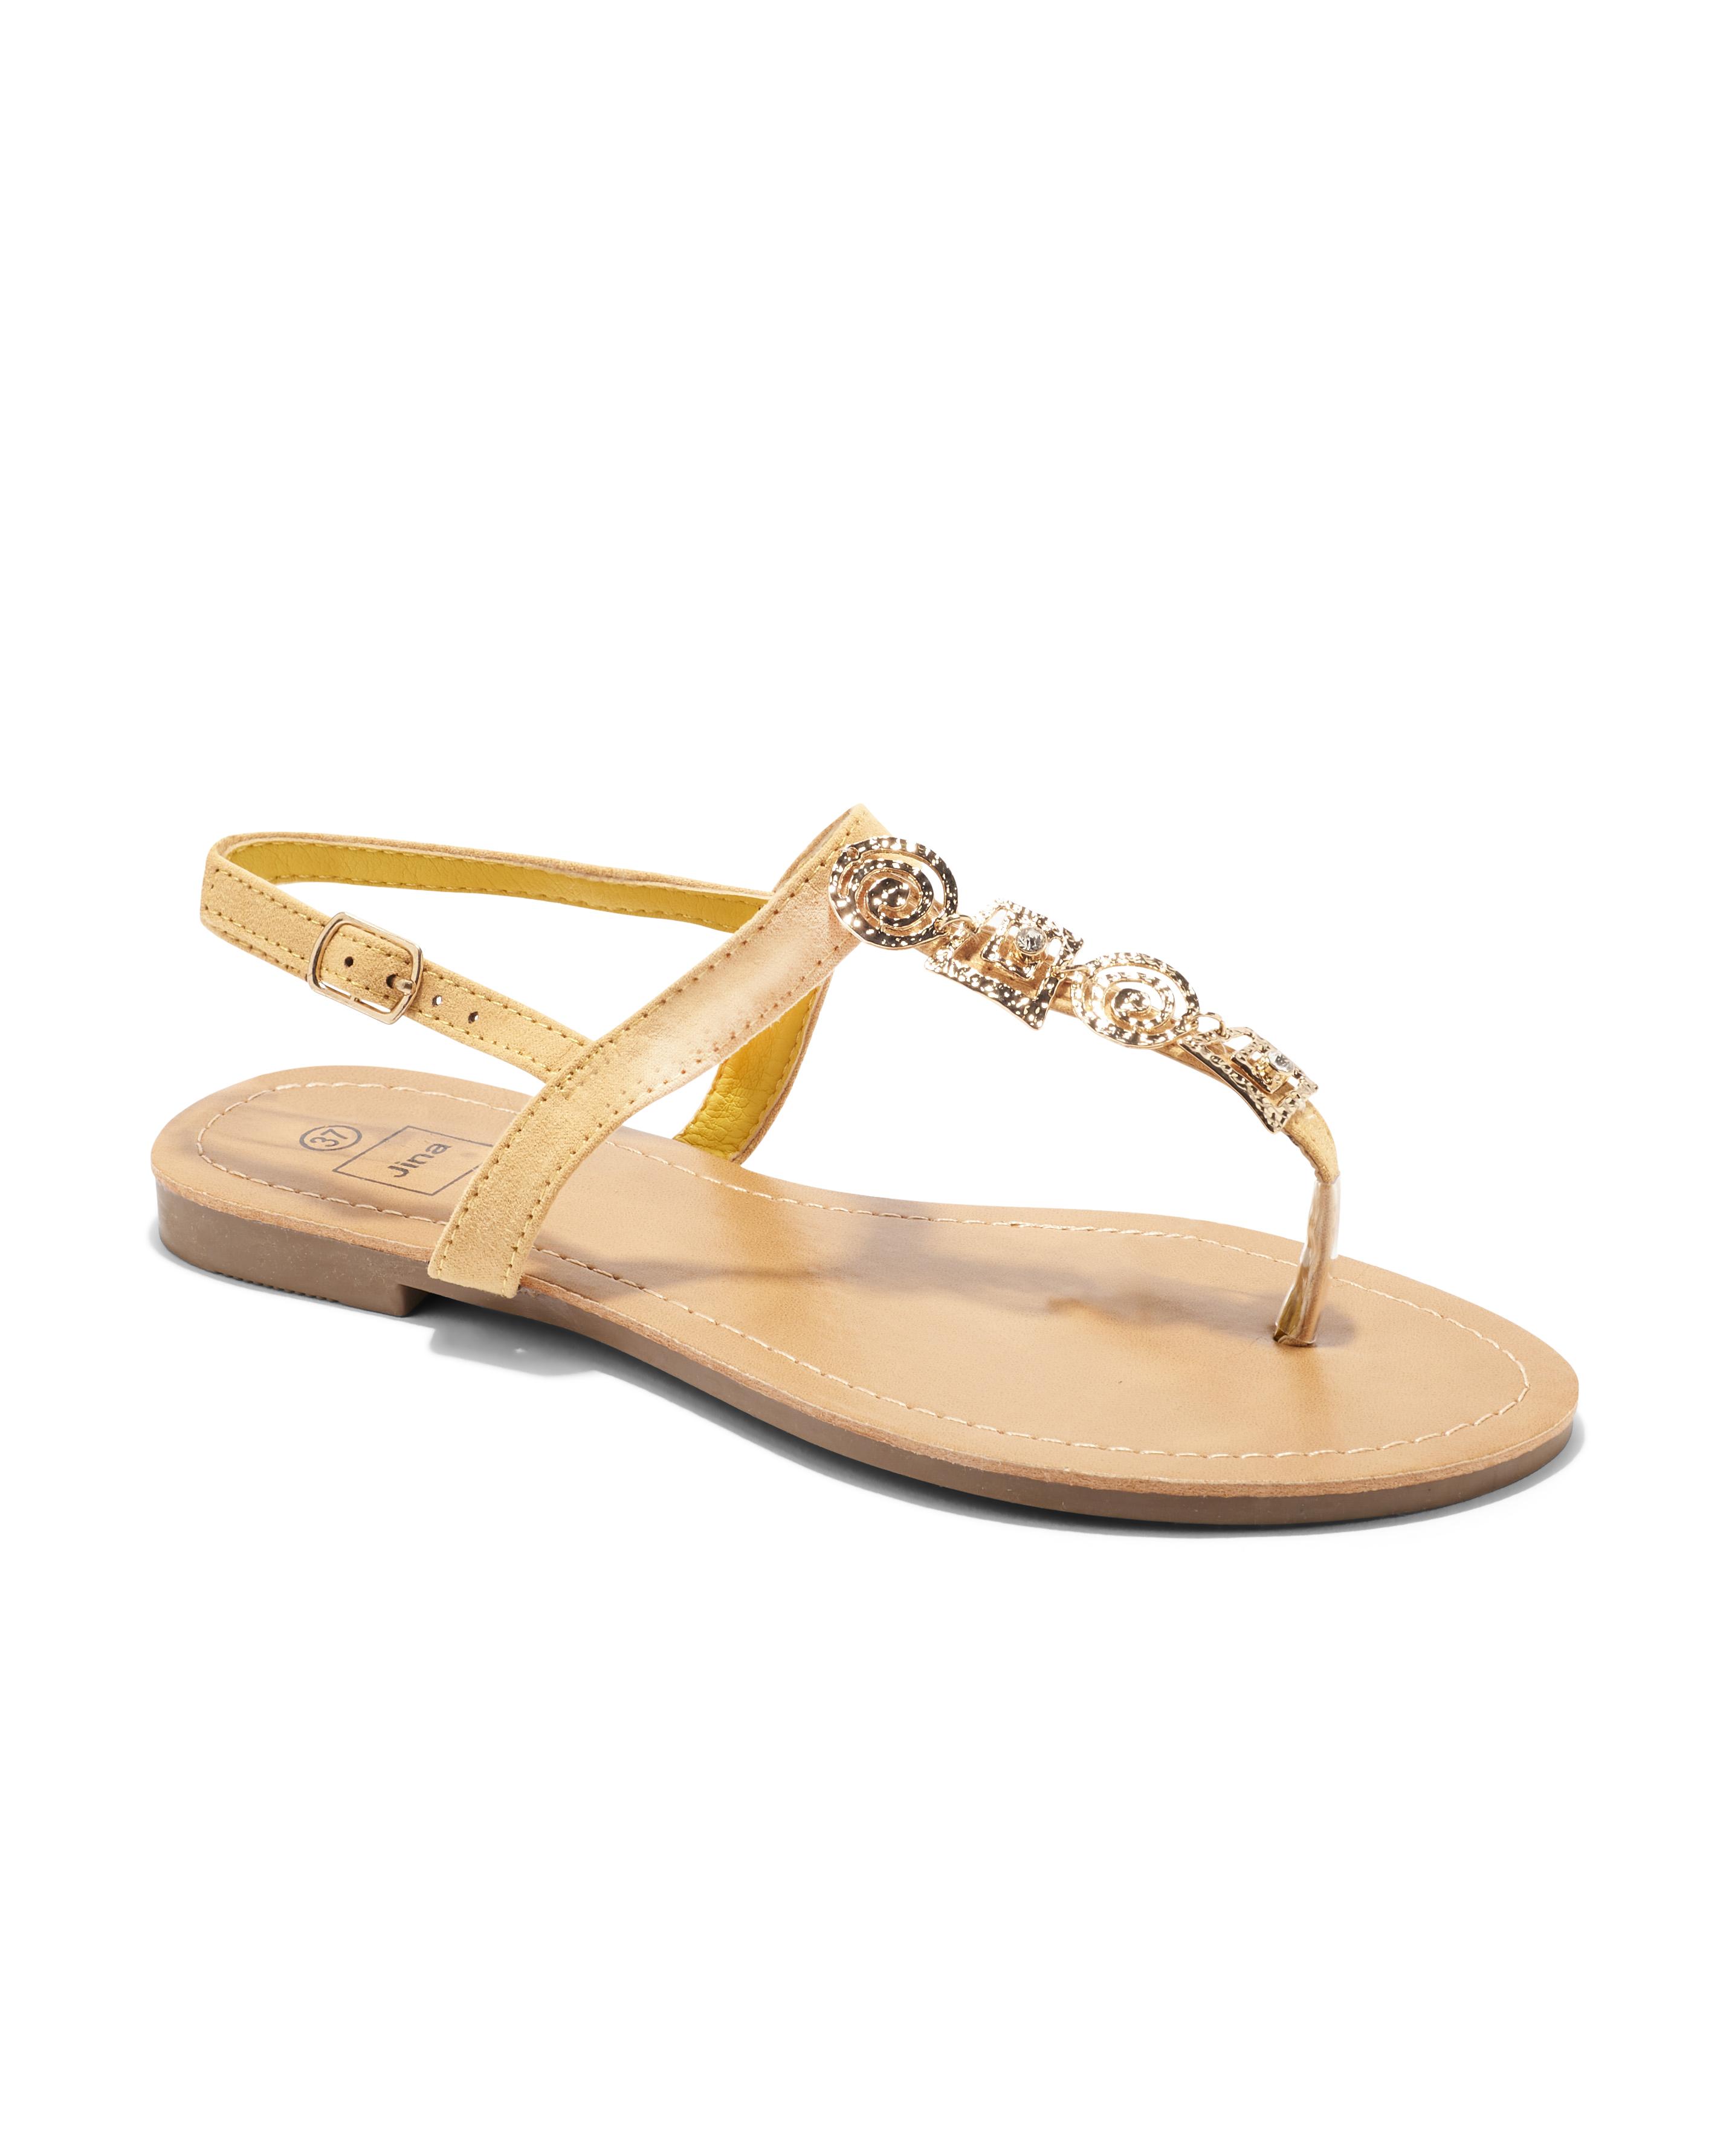 Sandales Plates Femme - Sandale Plate Moutarde Jina - Sapl Zh7